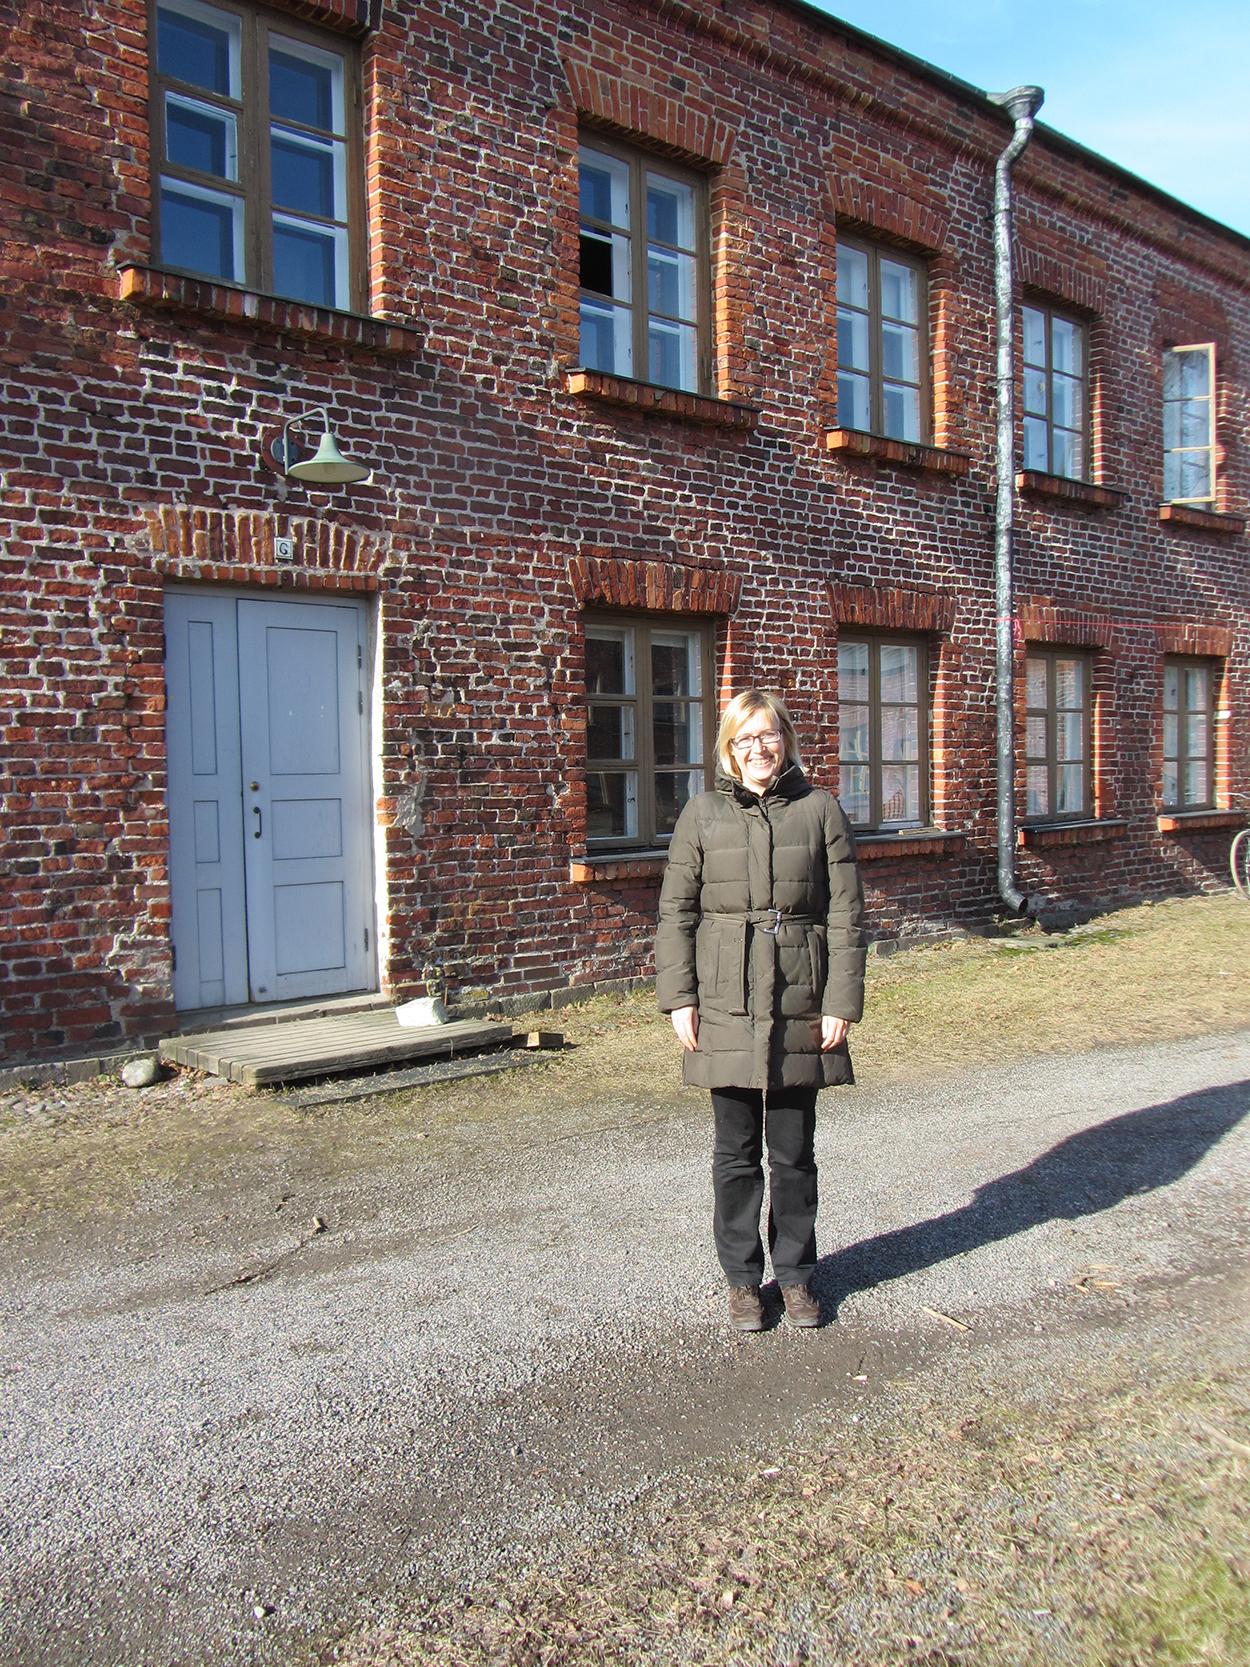 Julija Potrč Suomenlinnassa maaliskuussa 2015.